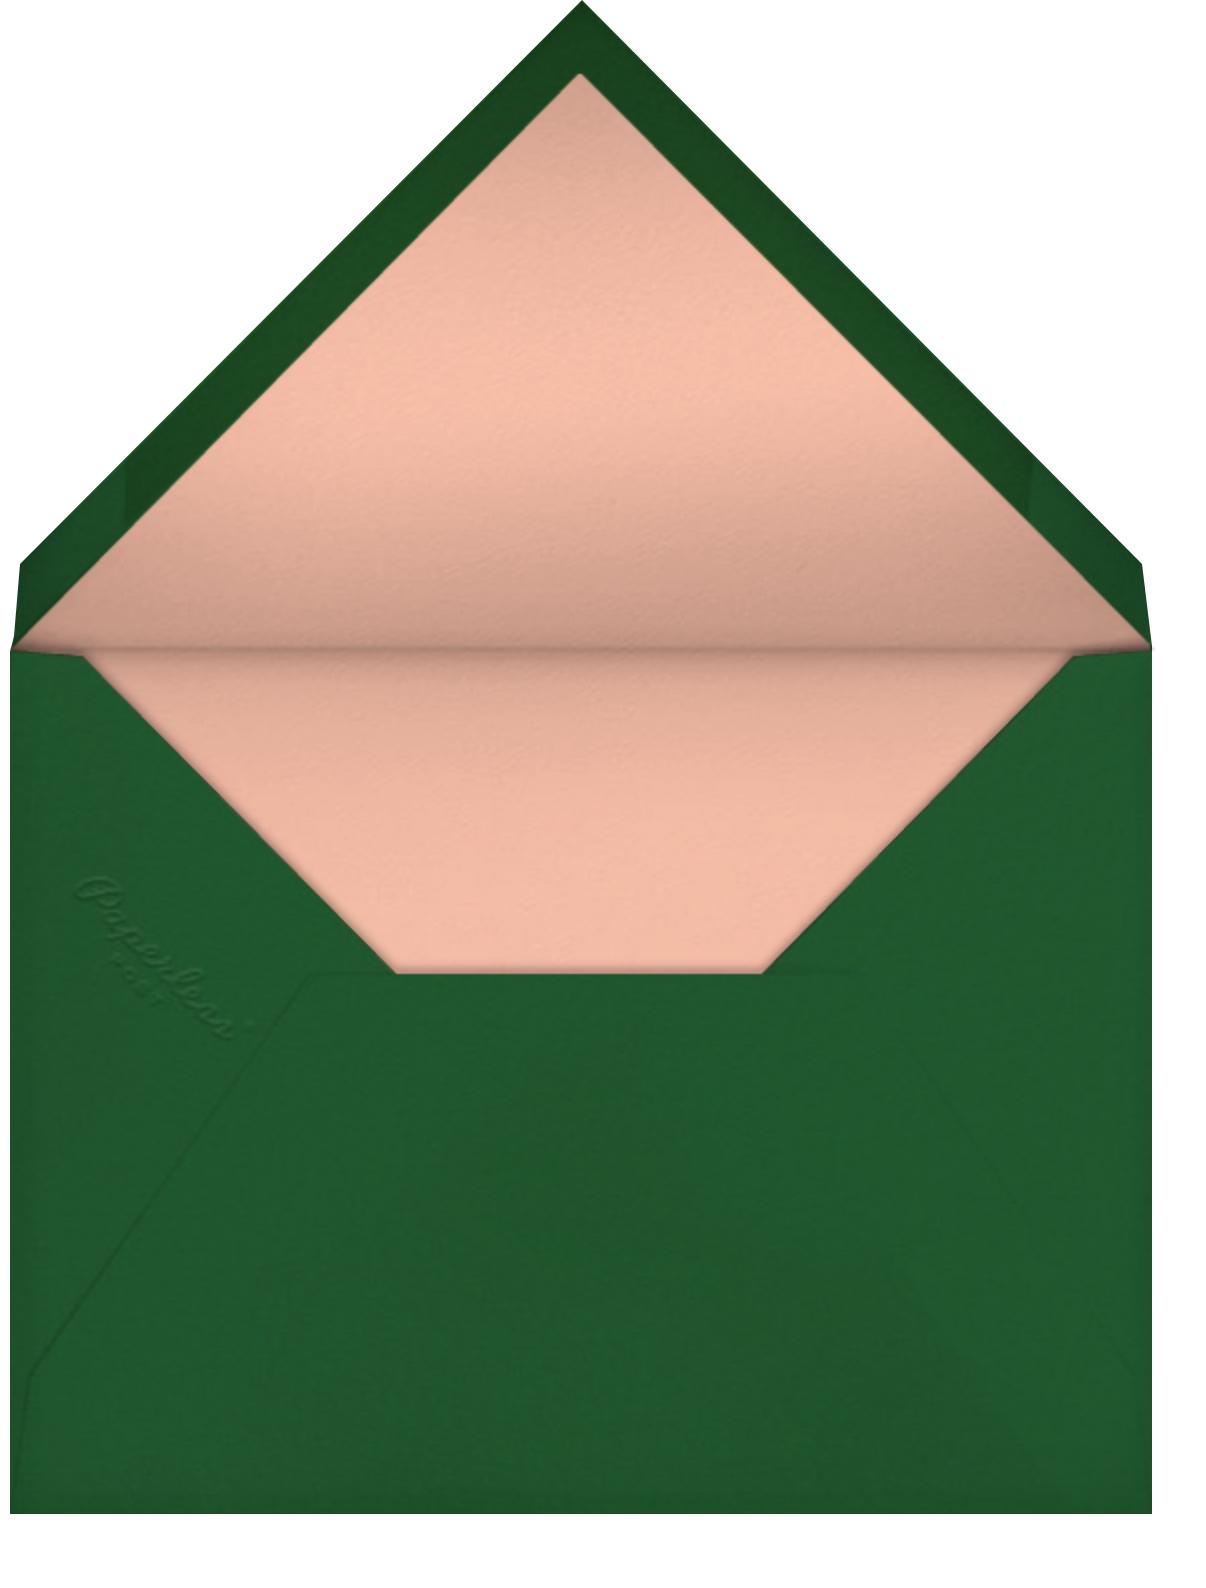 Gift Truck (Blanca Gómez) - Tan - Red Cap Cards - Birthday - envelope back